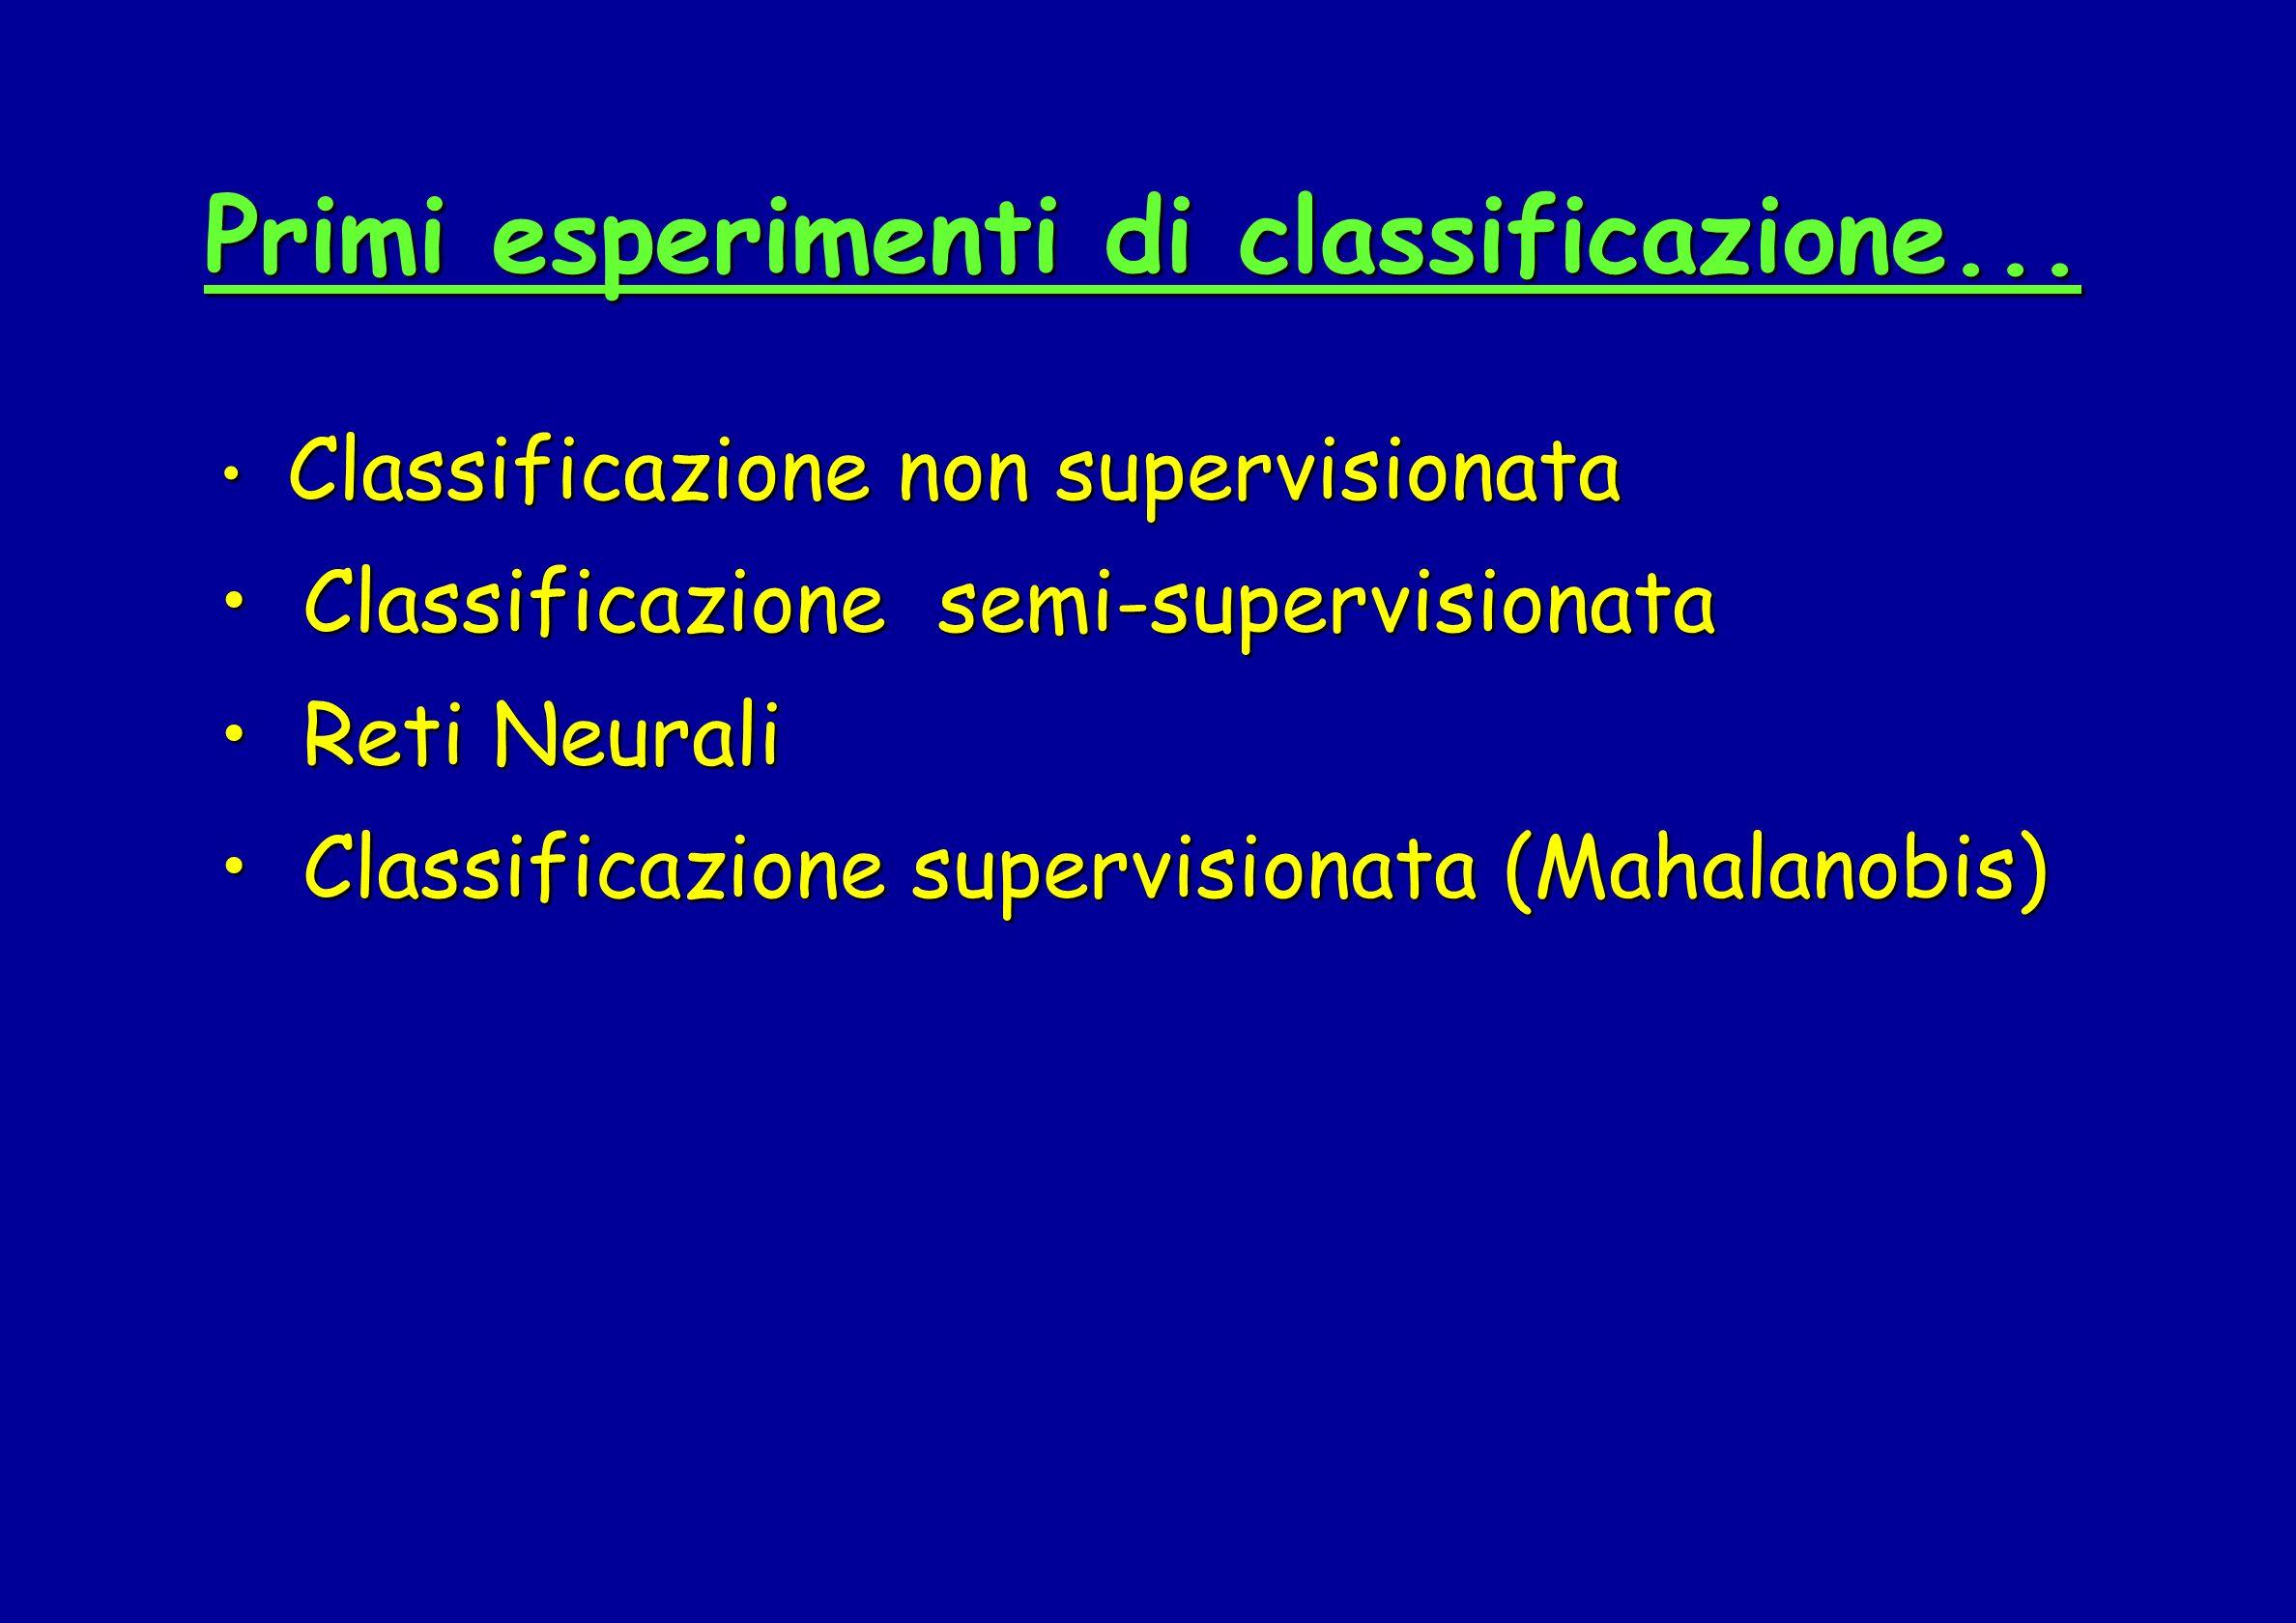 Primi esperimenti di classificazione... Classificazione non supervisionata Classificazione non supervisionata Classificazione semi-supervisionata Clas